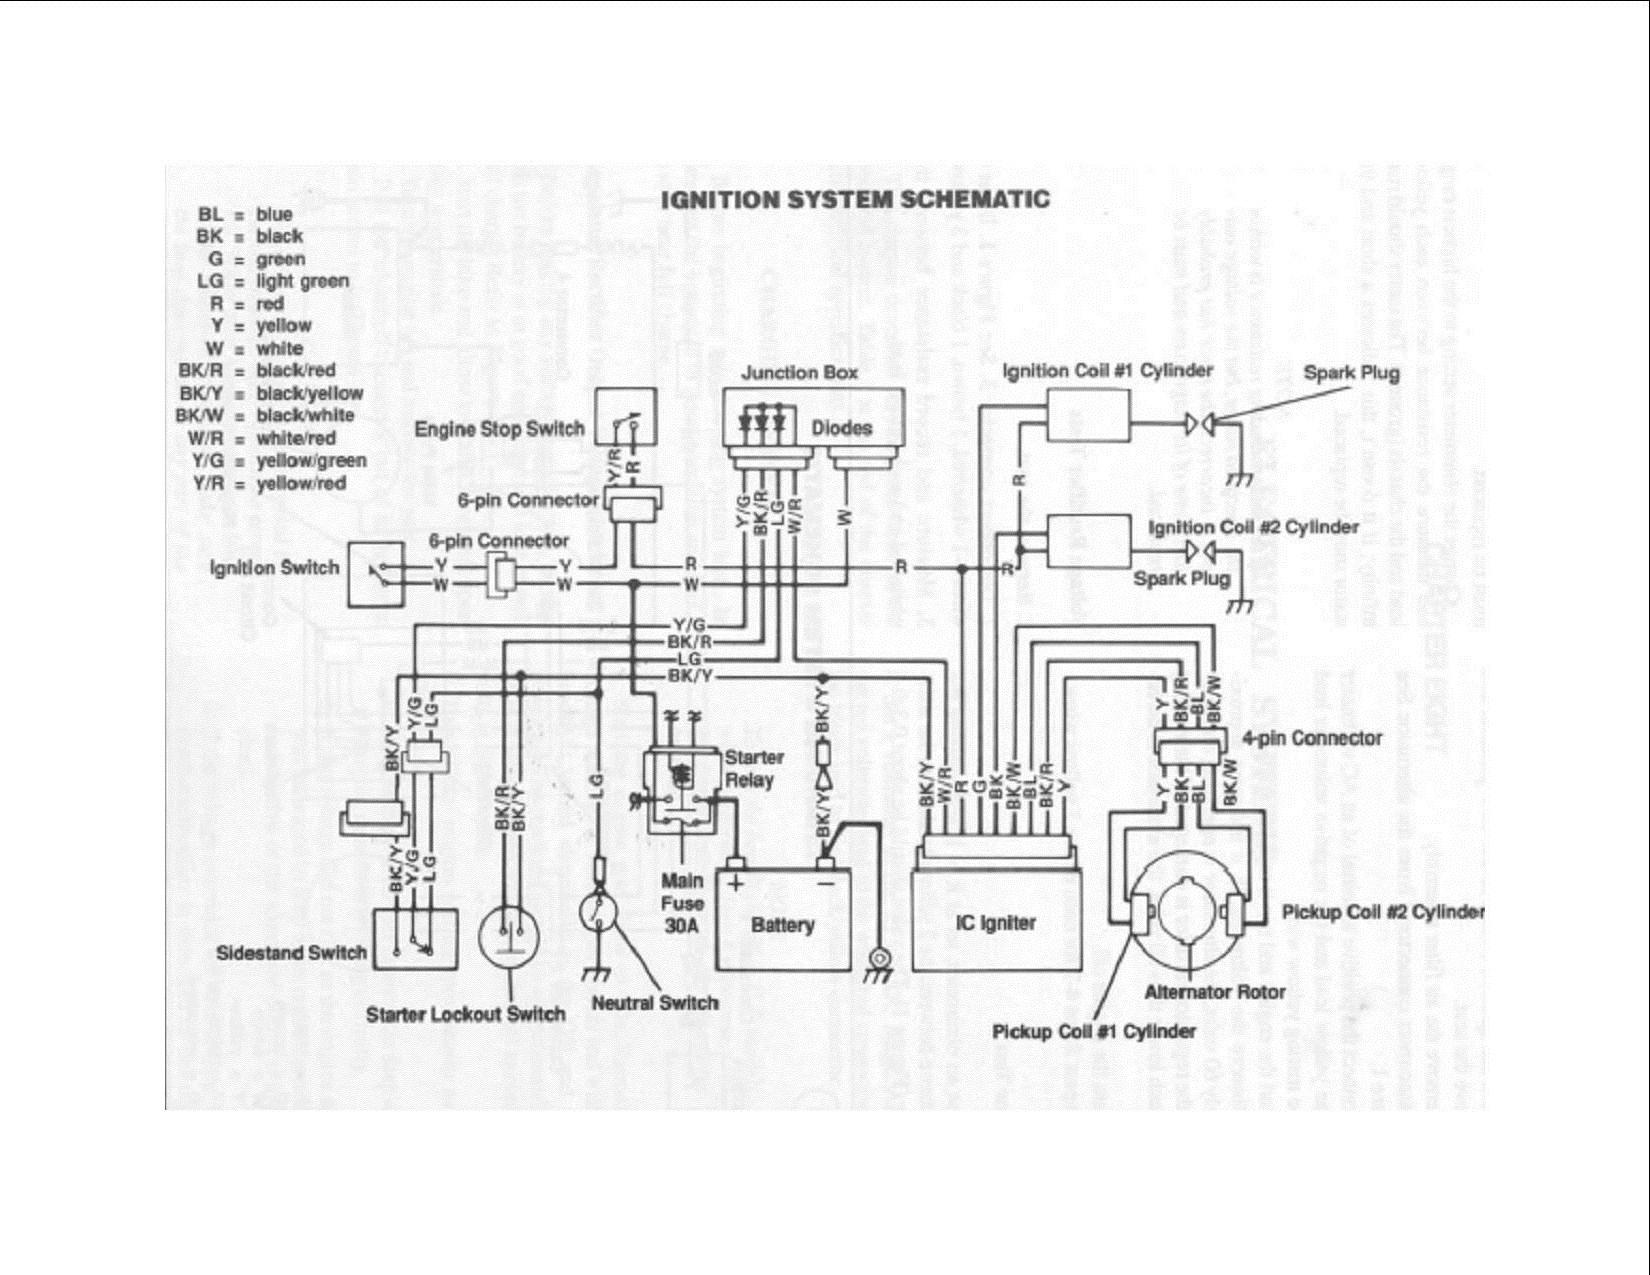 How To Get Power Ex 500 Com The Home Of The Kawasaki Ex500 Ninja 500r